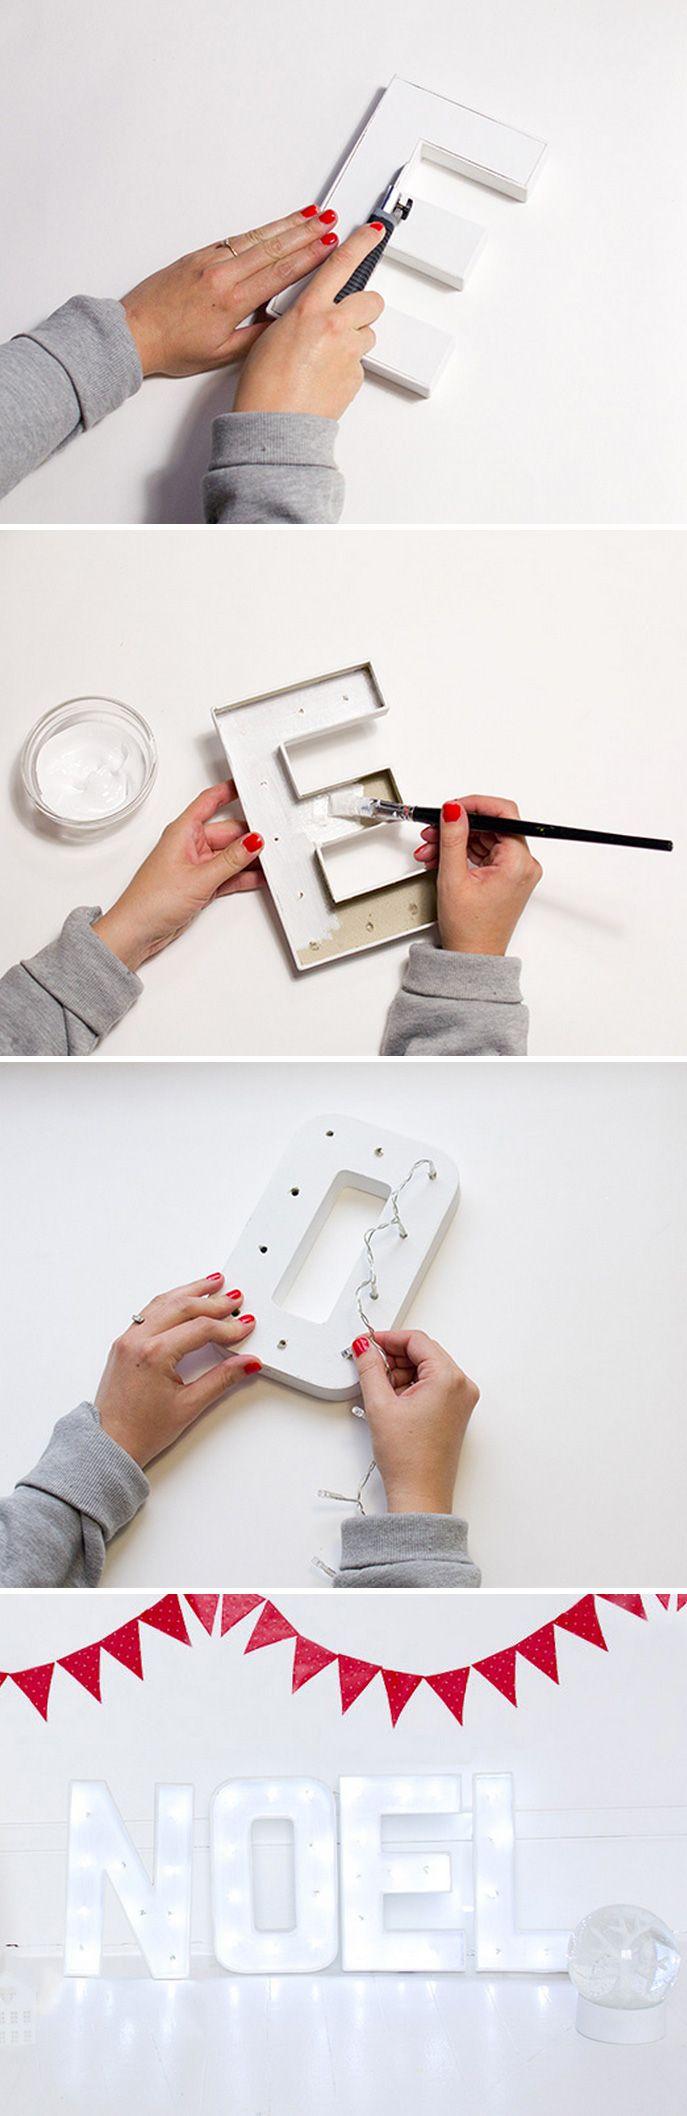 DIY : Noël lumineux – Vert Cerise - Blog DIY - Do It Yourself - lifestyle et créatif